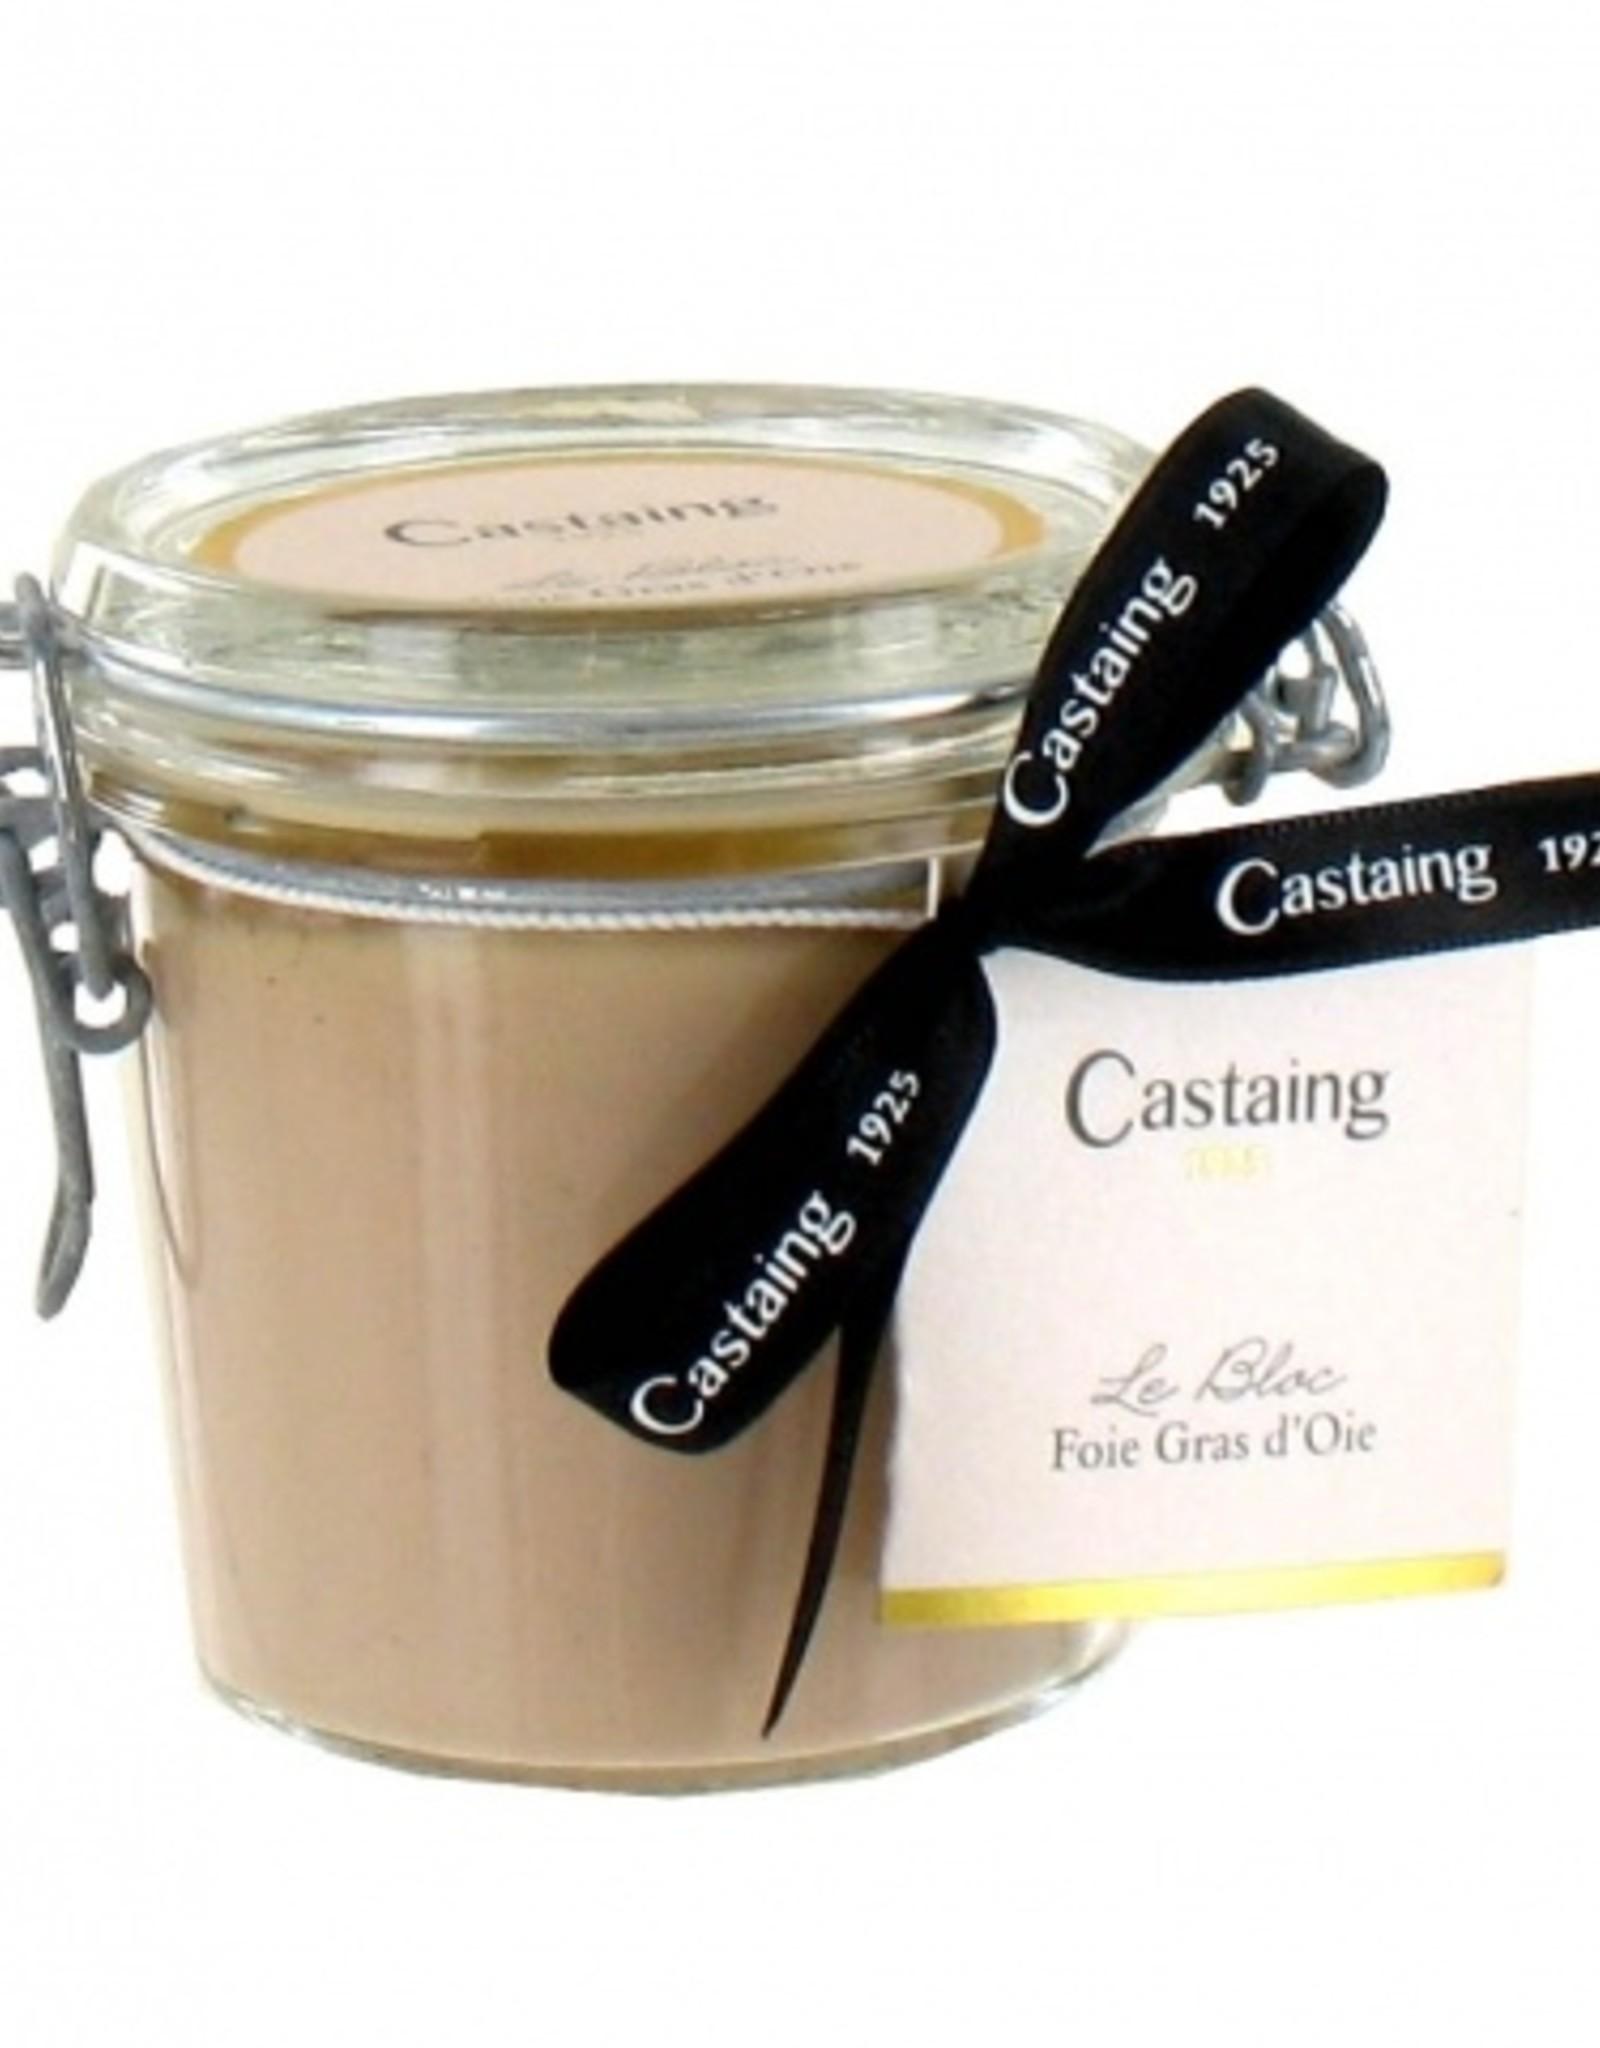 Castaing, Bloc de Fois Gras, 180 g - im Glastopf